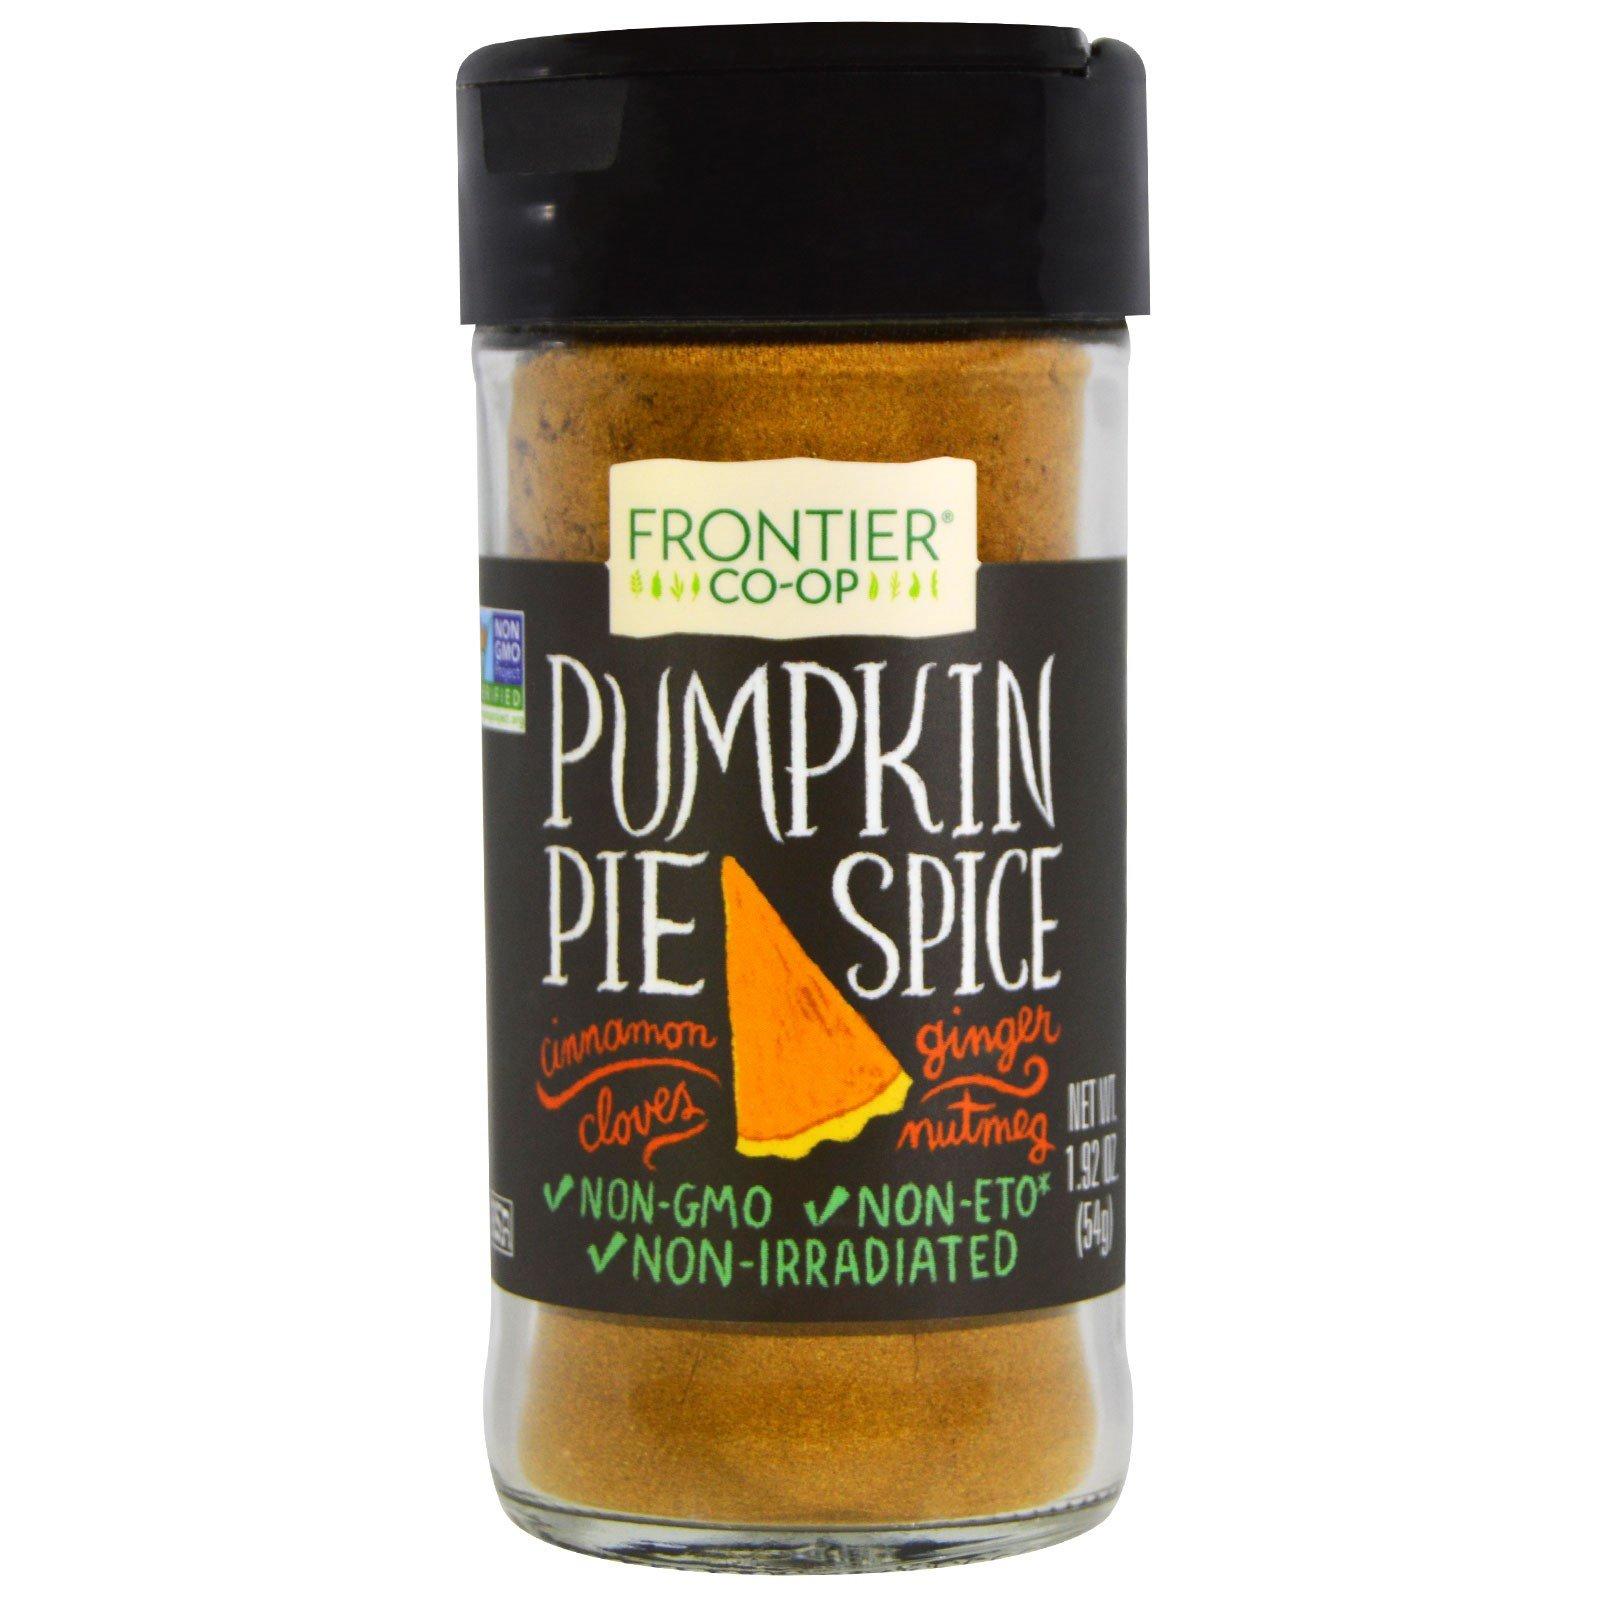 Frontier Natural Products, Pumpkin Pie Spice, 1.92 oz (54 g)